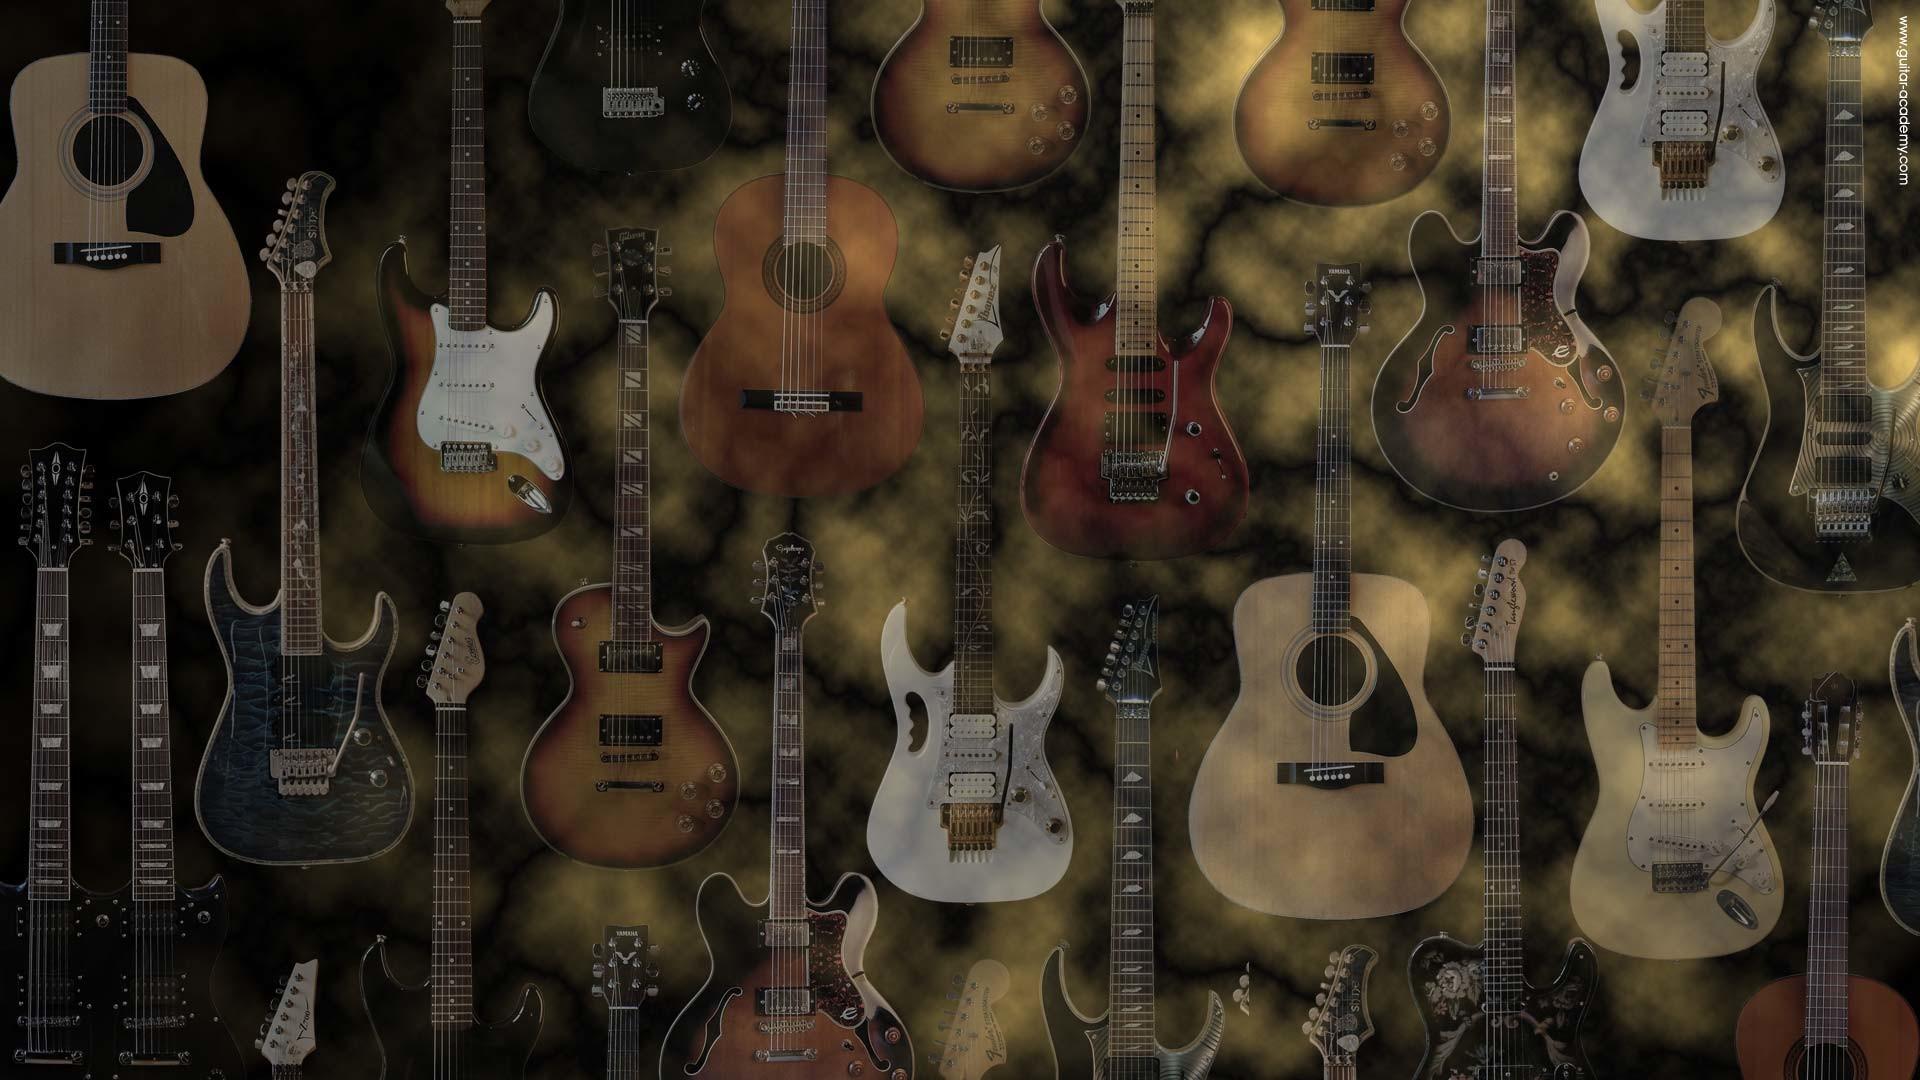 Wallpaperwiki Acoustic Guitar Wallpaper Download Free PIC